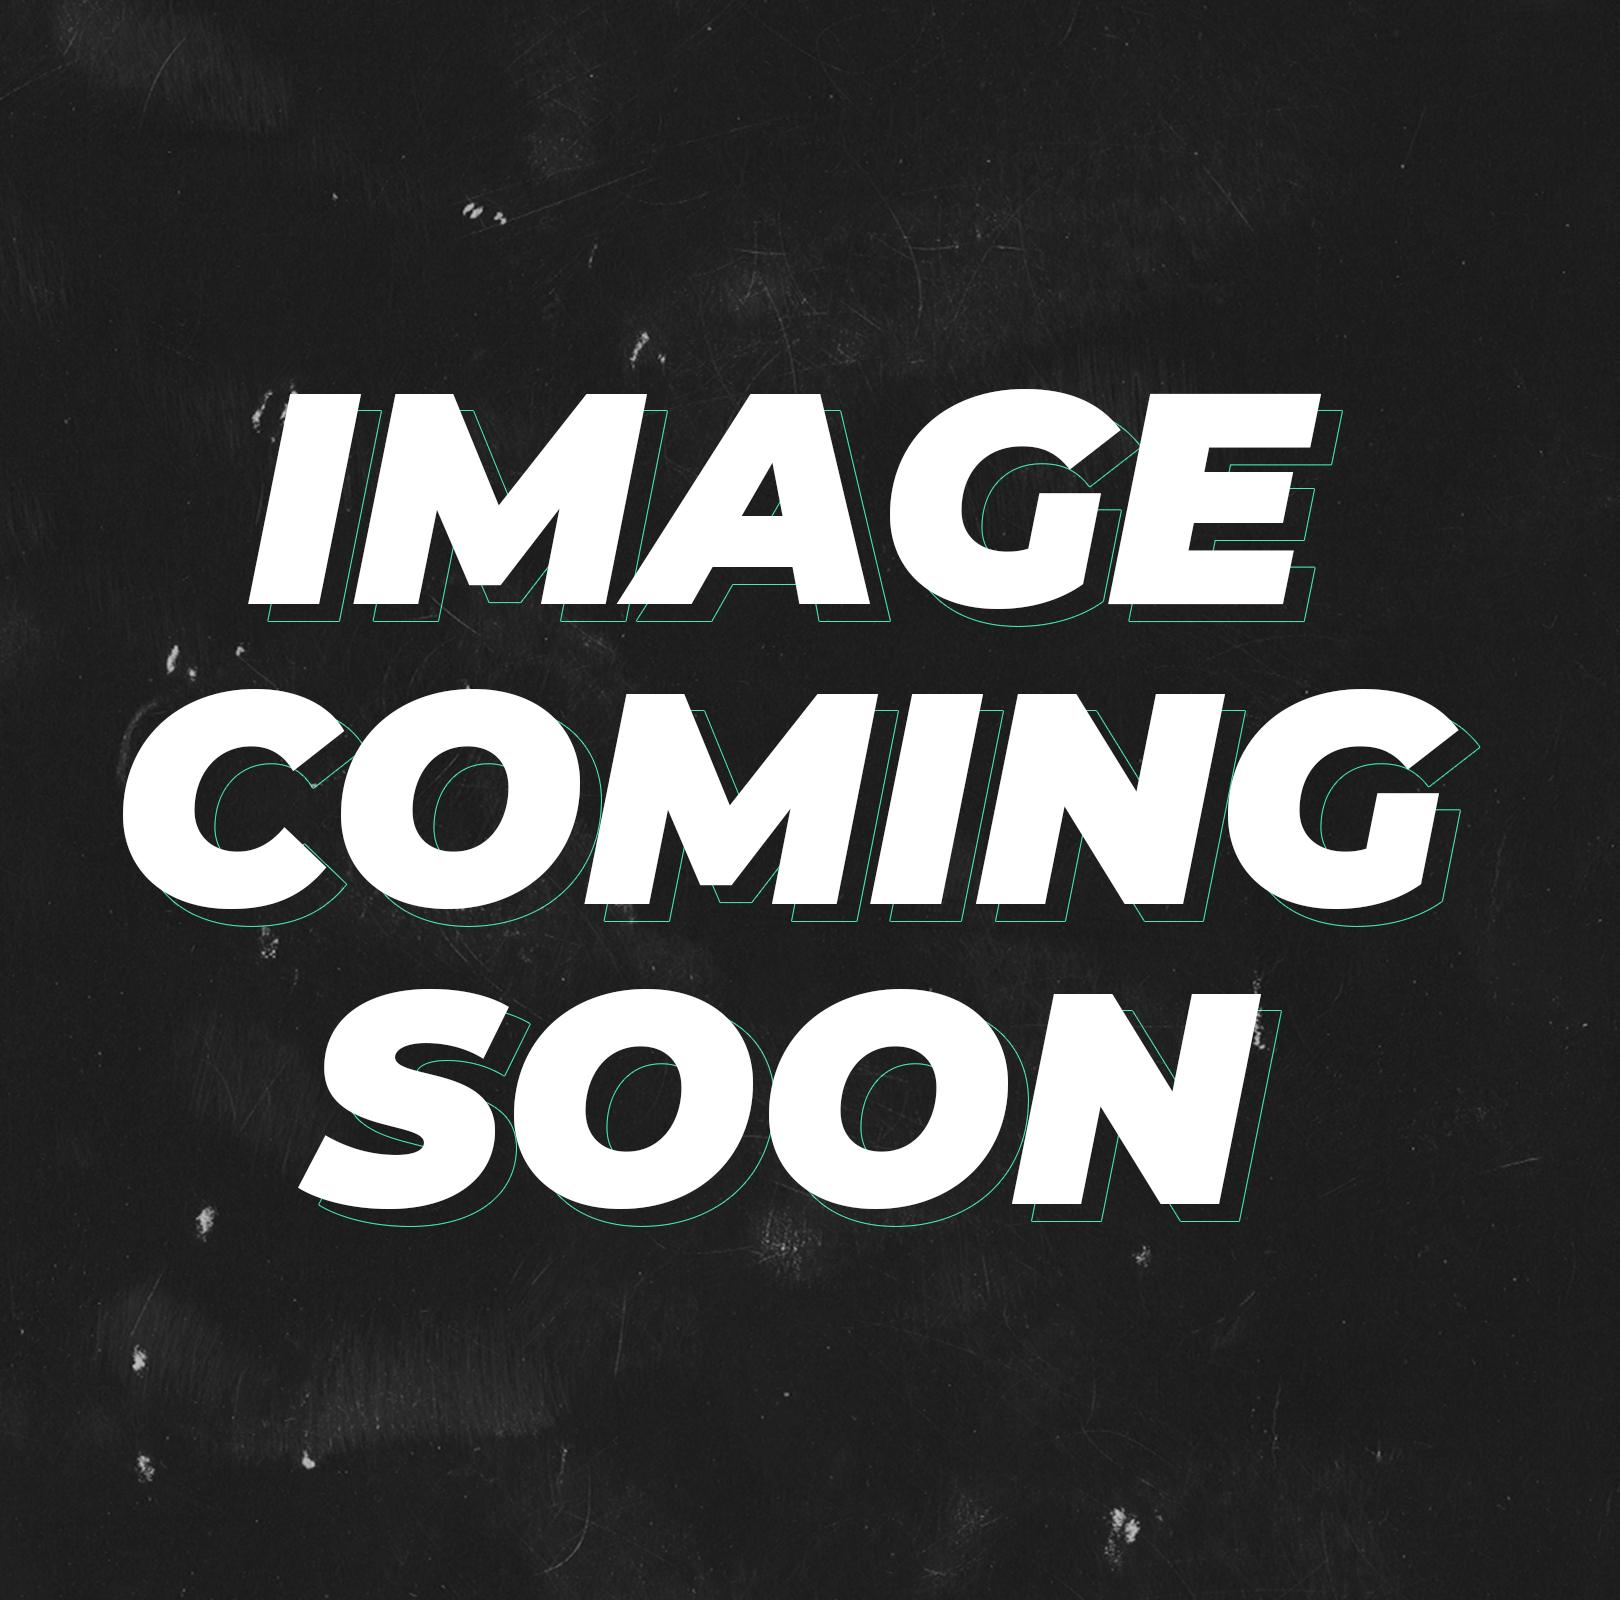 Toro Full Matt Black/Stainless Exhaust System - Sinnis Hoodlum 125 2017-2020